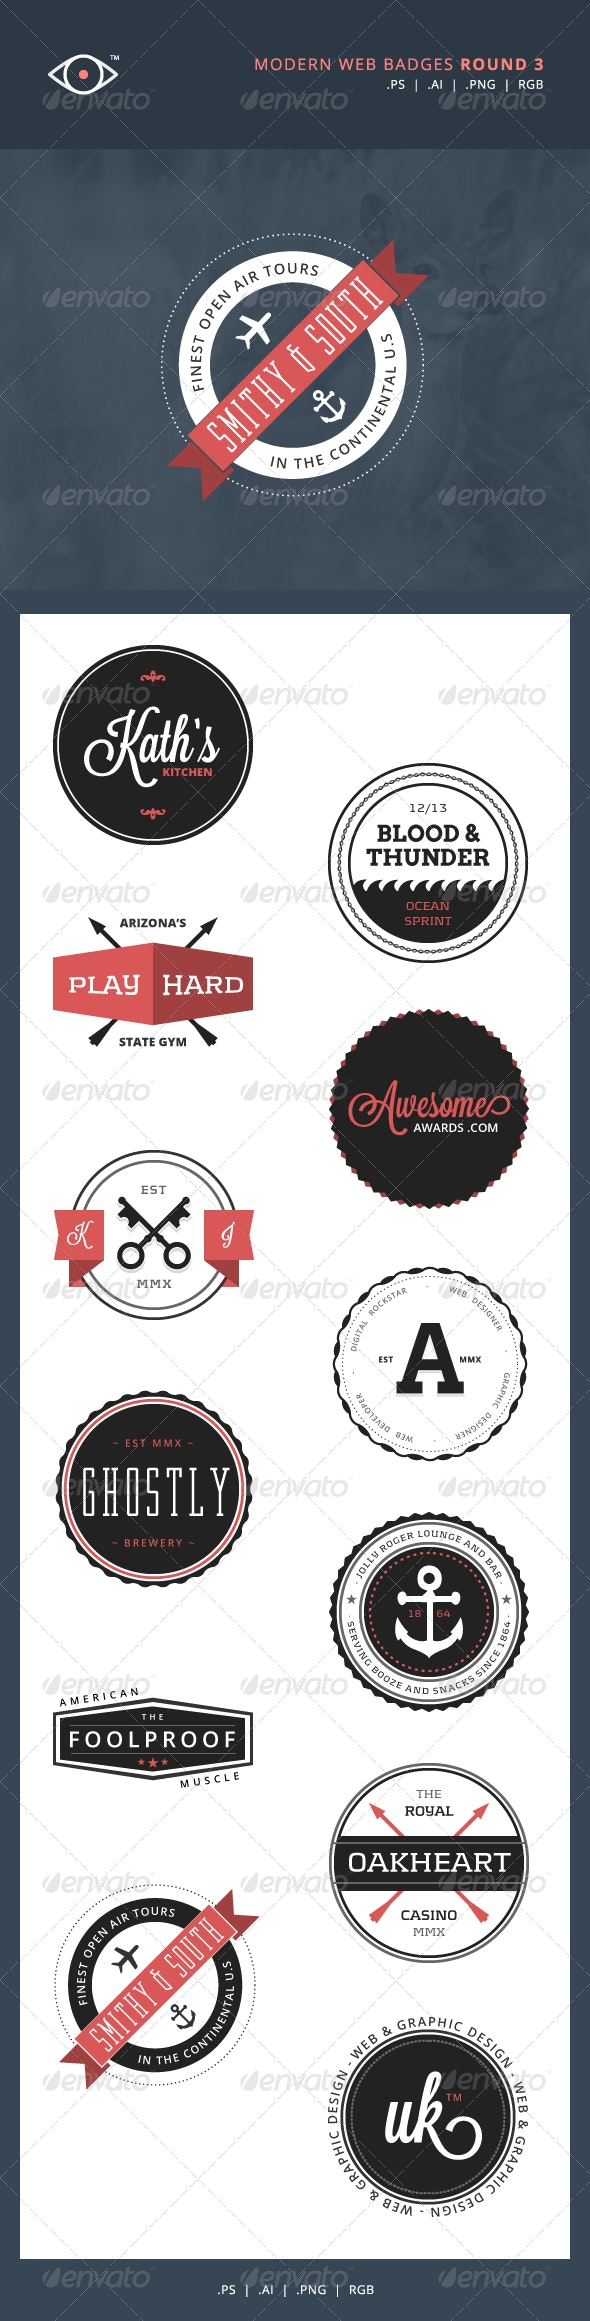 Modern Web Badges - Round 3 - Badges & Stickers Web Elements